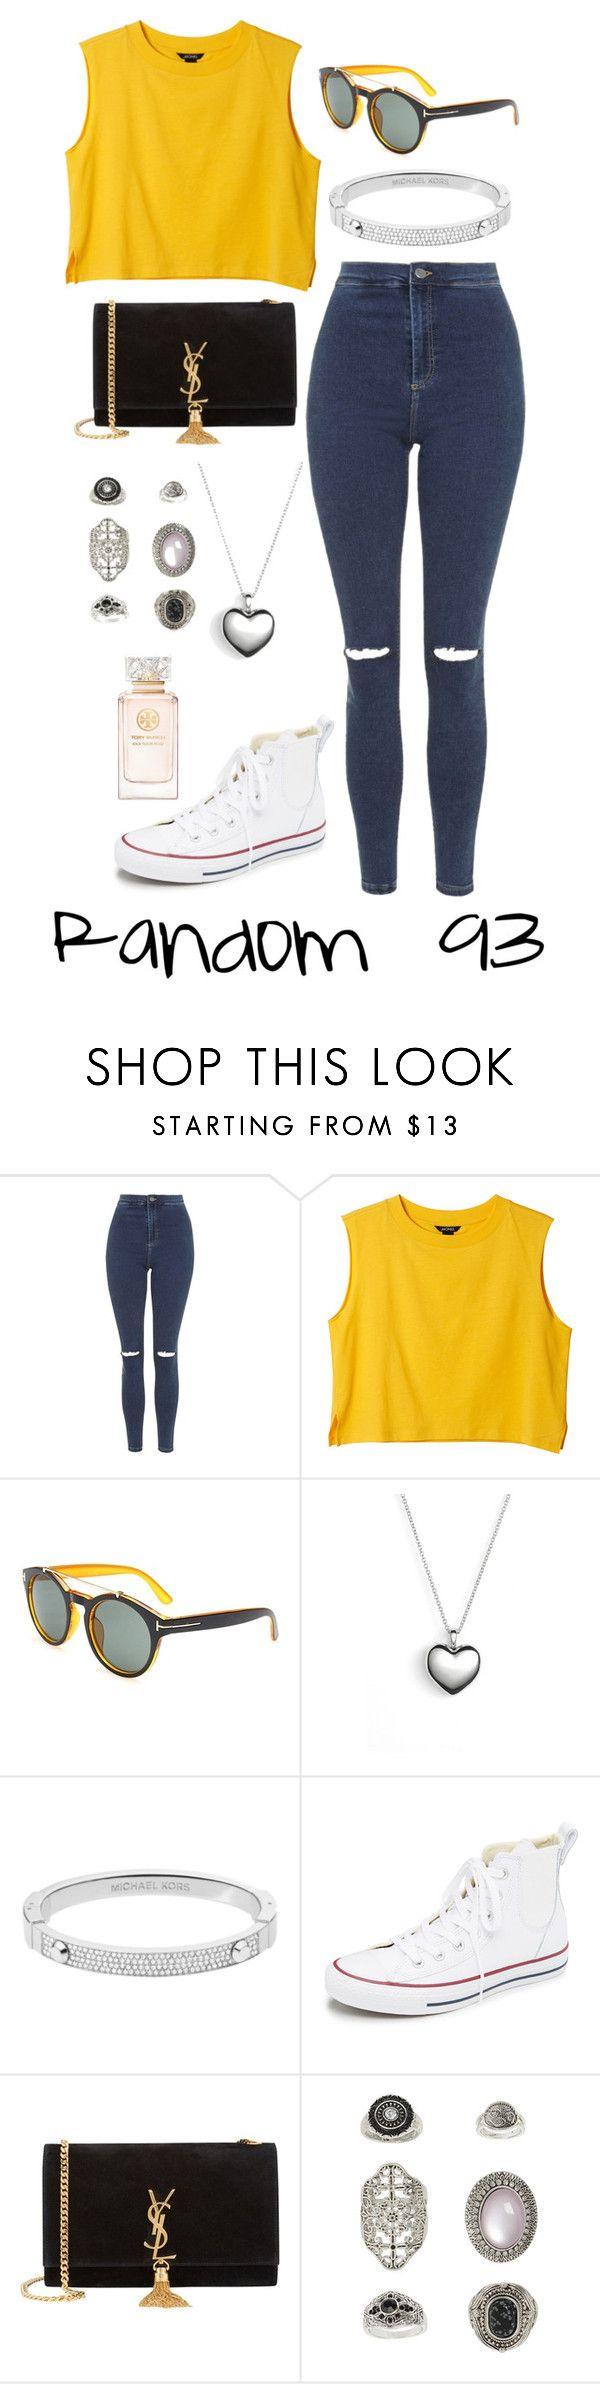 """Random 93"" by megan-walz21 ❤ liked on Polyvore featuring Topshop, Monki, Pandora, Michael Kors, Converse, Yves Saint Laurent and Tory Burch"